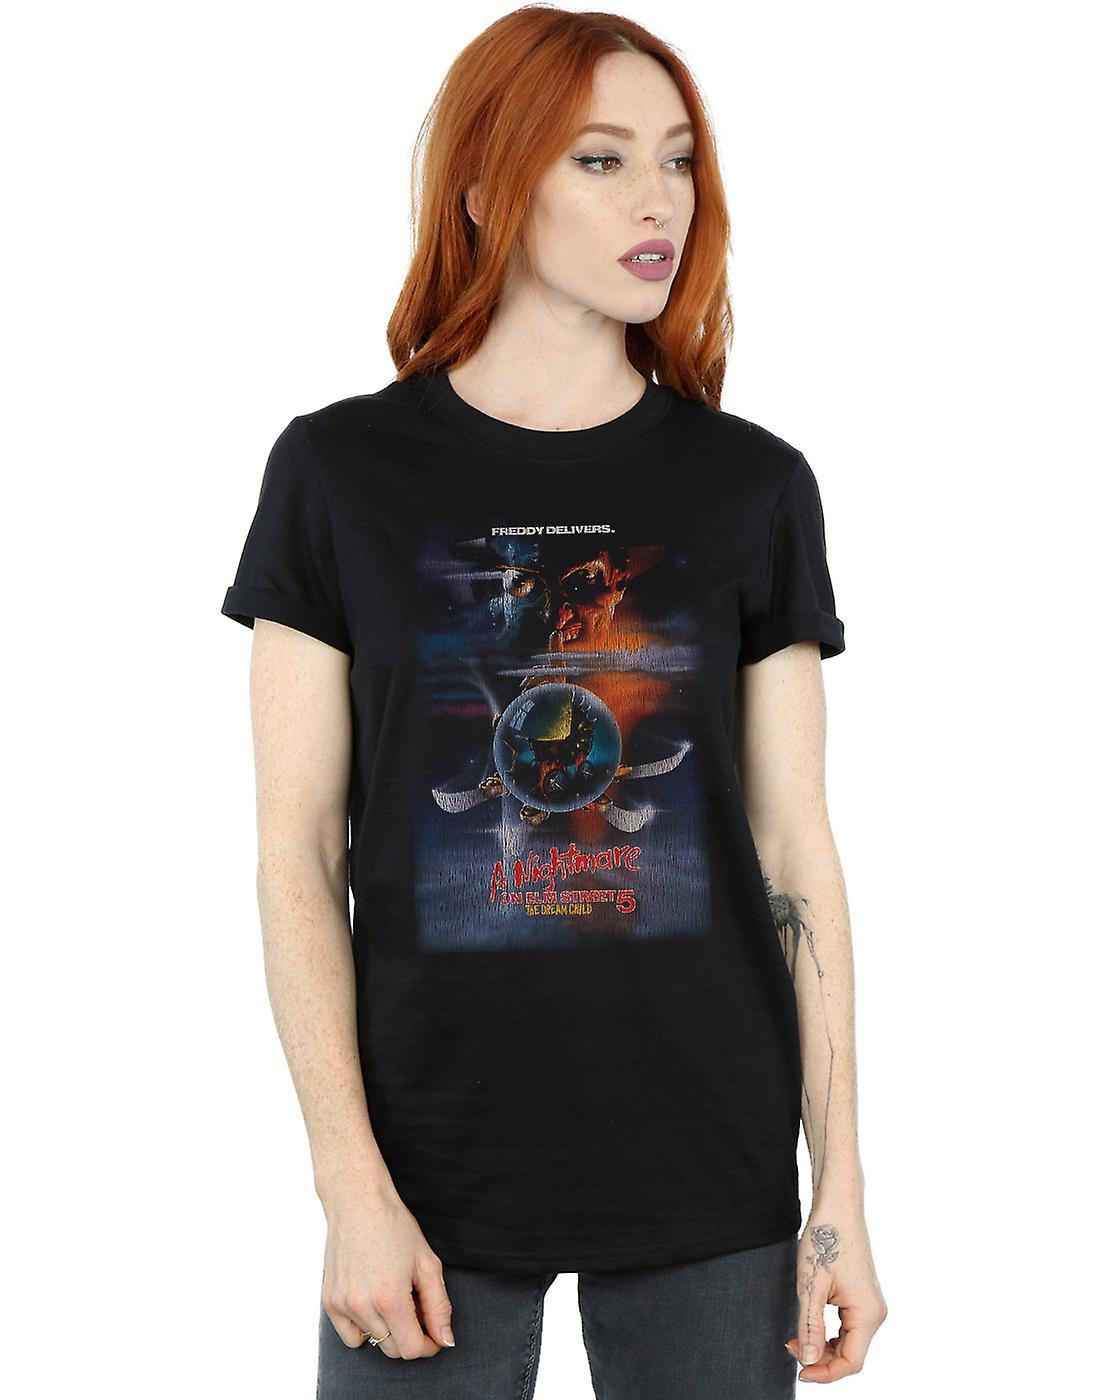 A Nightmare On Elm Street Women's The Dream Child Boyfriend Fit T-Shirt